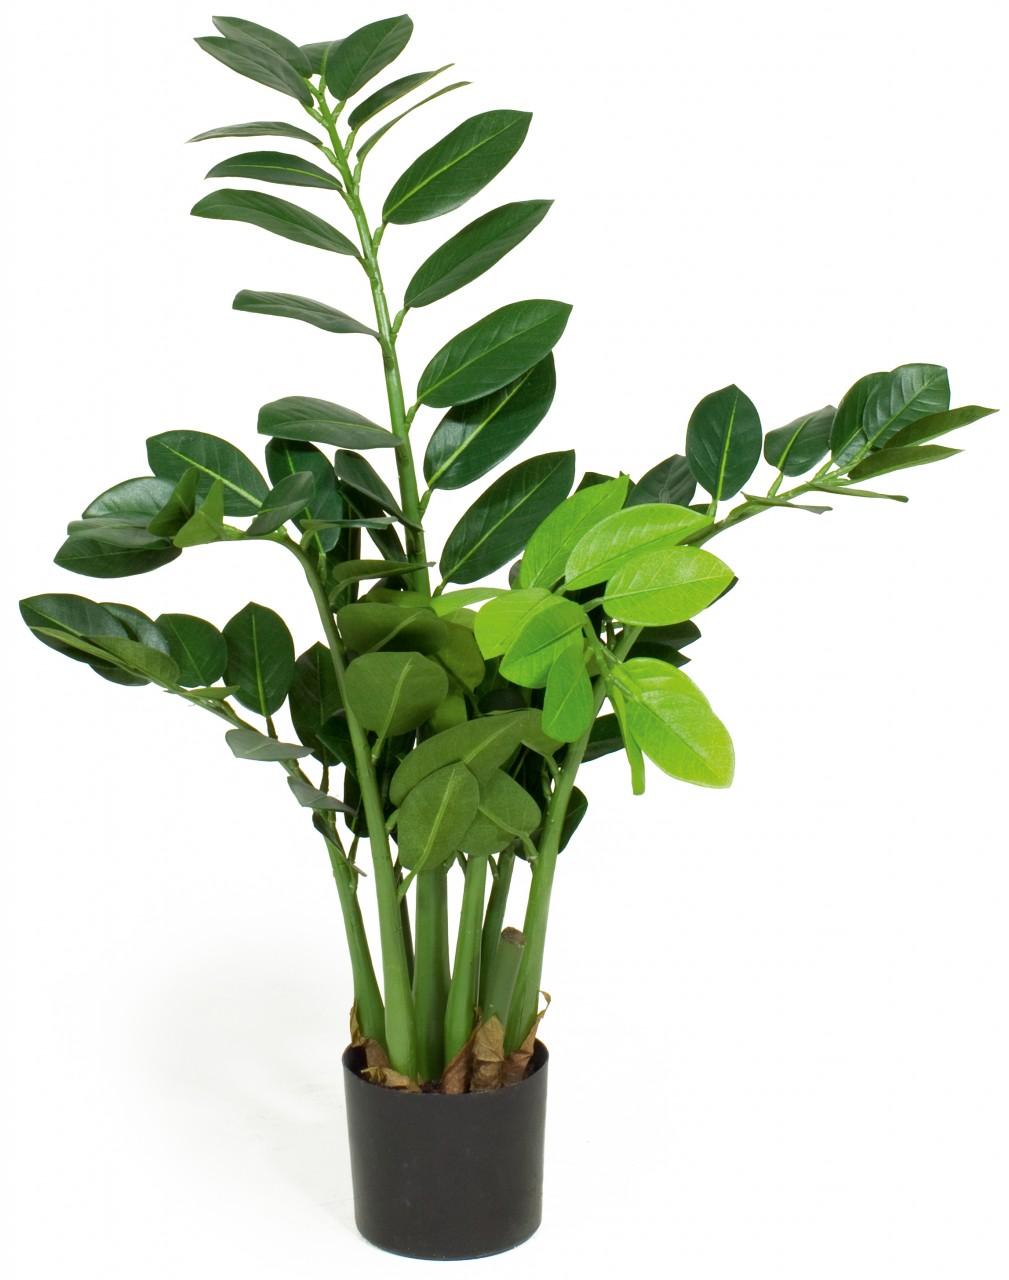 ZAMIOCULCAS Kunstpflanze, 110 cm